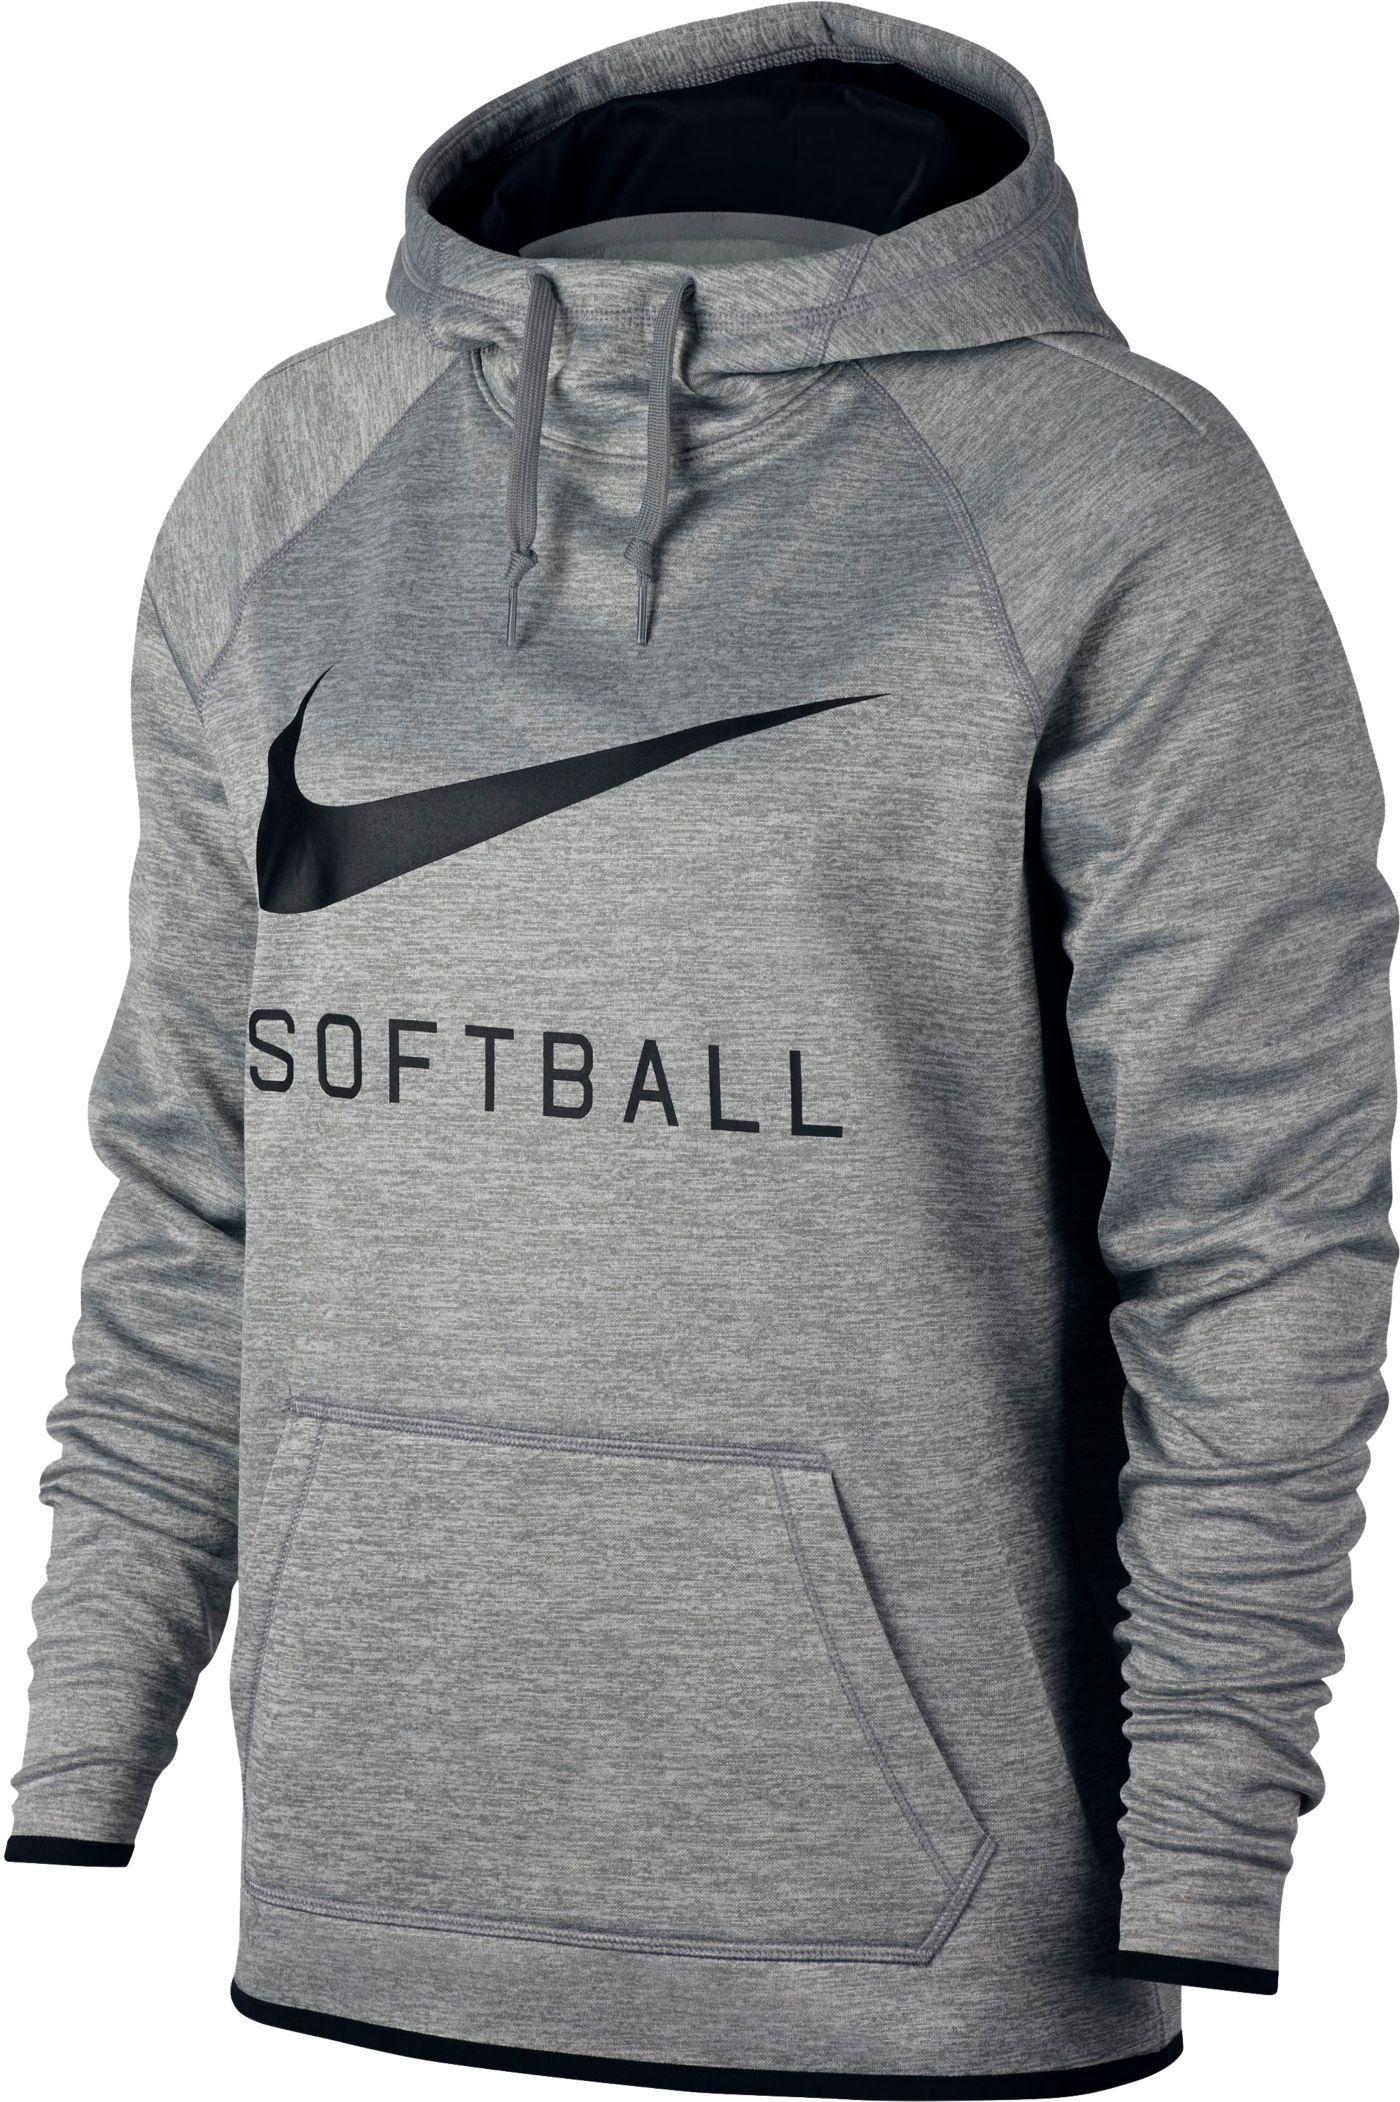 Nike Women's Softball Pullover Hoodie